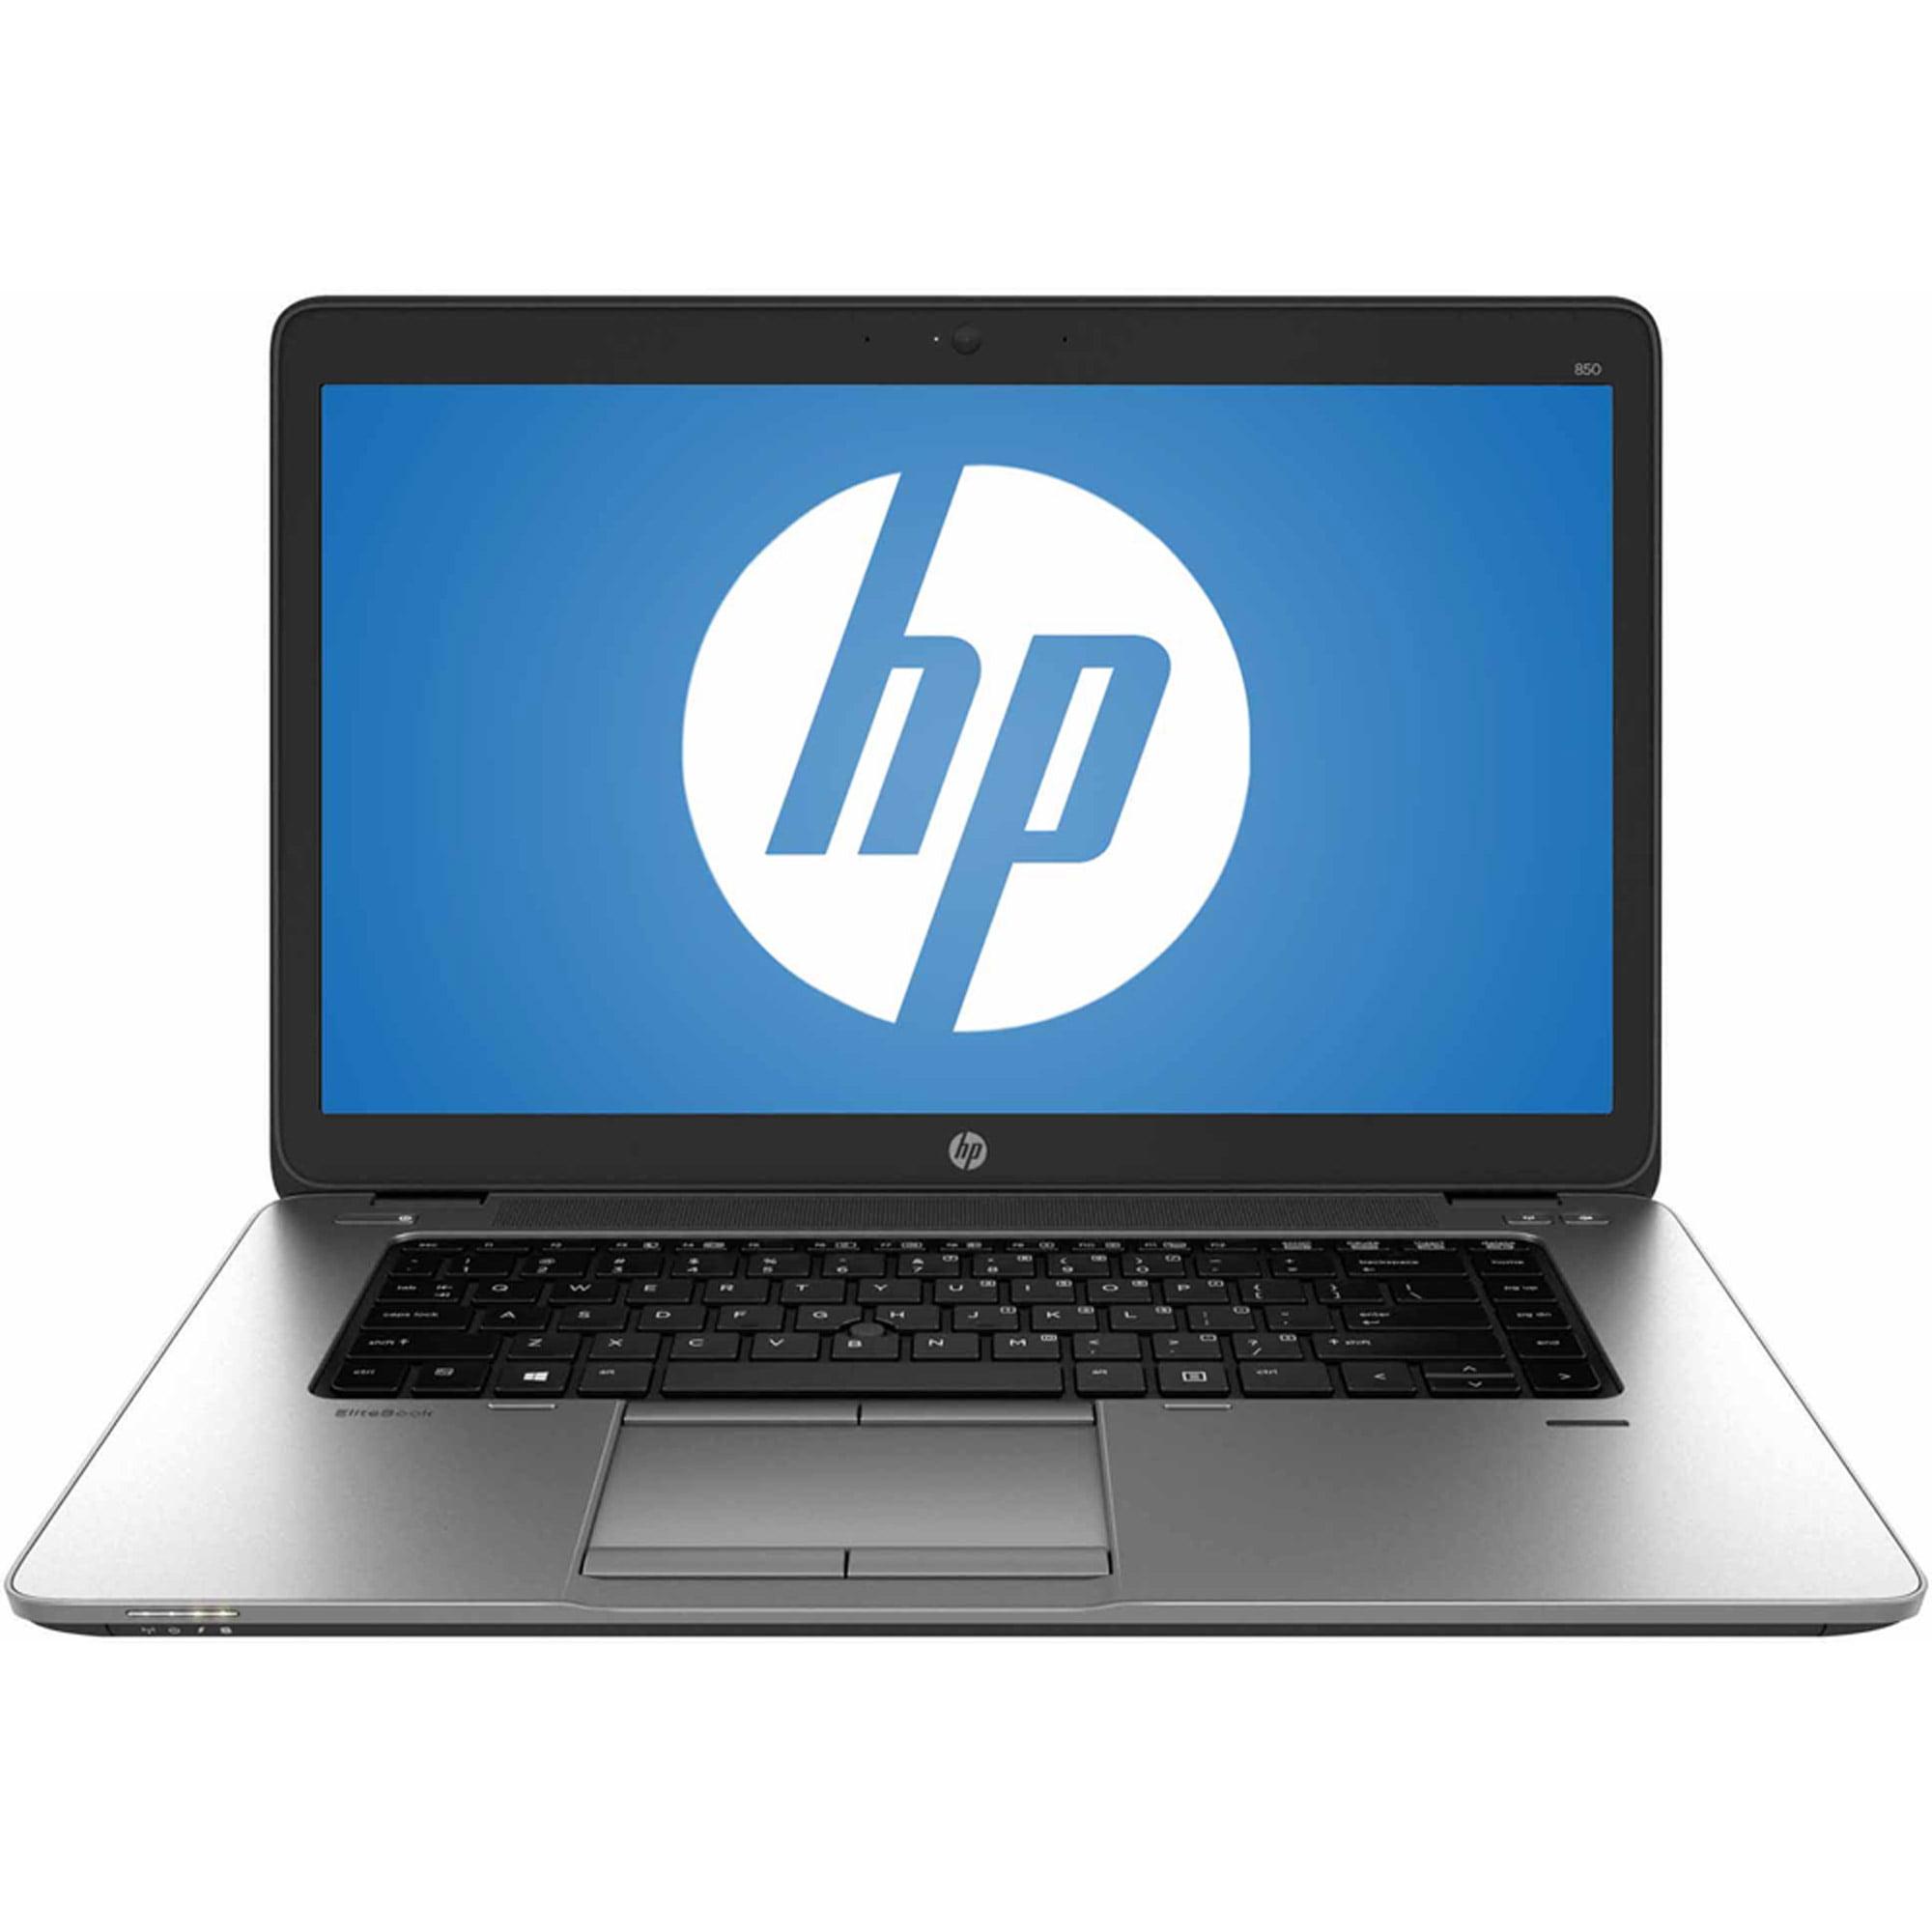 HP Silver/Black 15.6